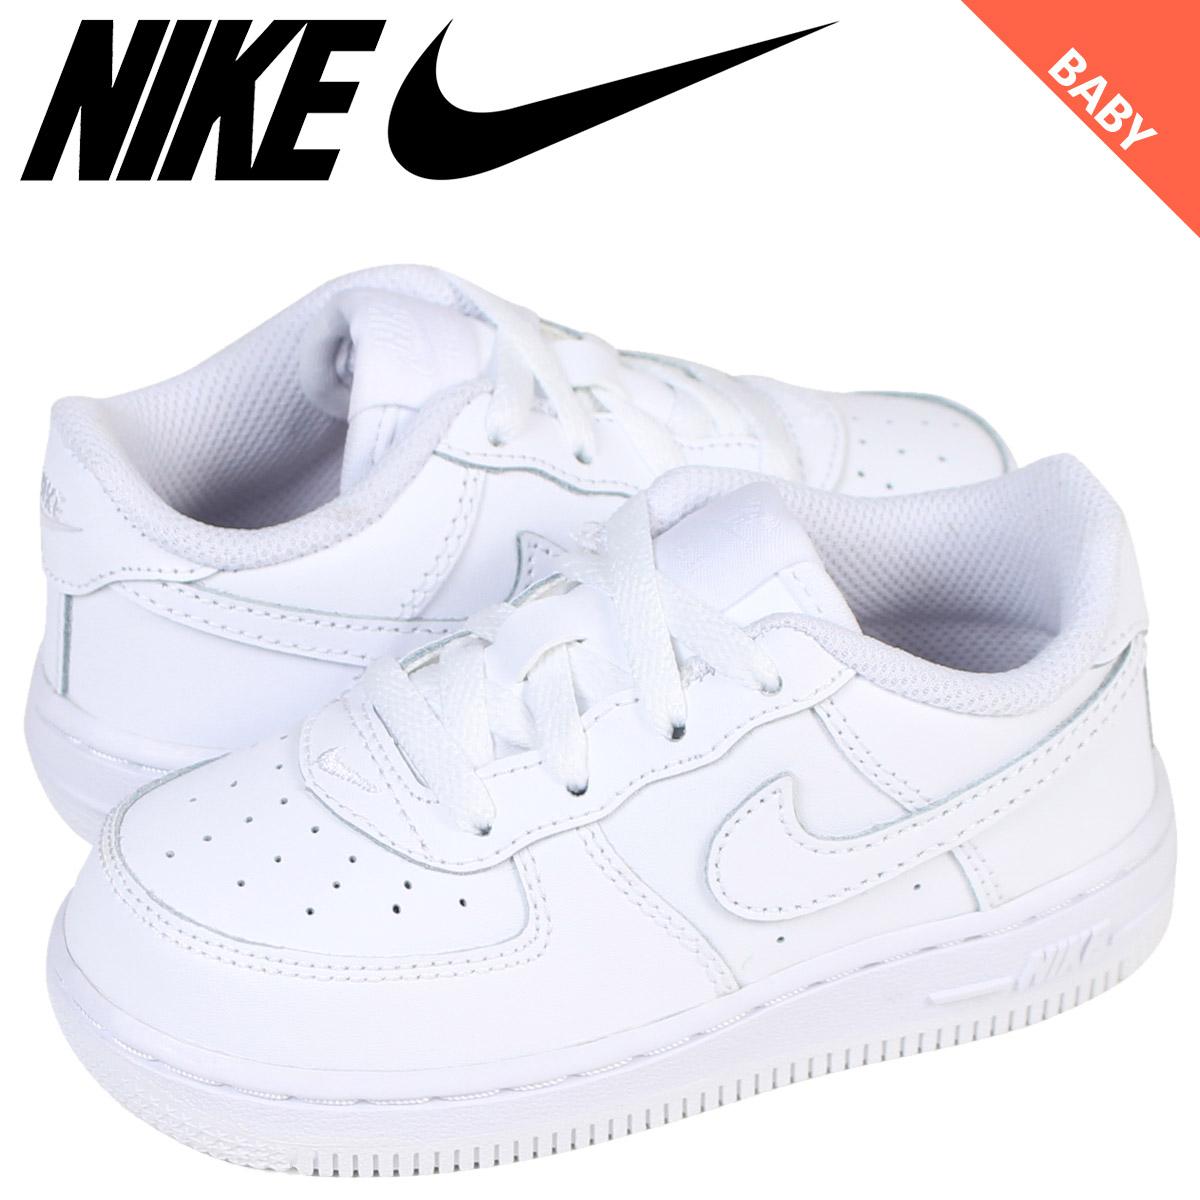 NIKE AIR FORCE 1 TD Nike air force 1 sneakers baby white 314,194 117